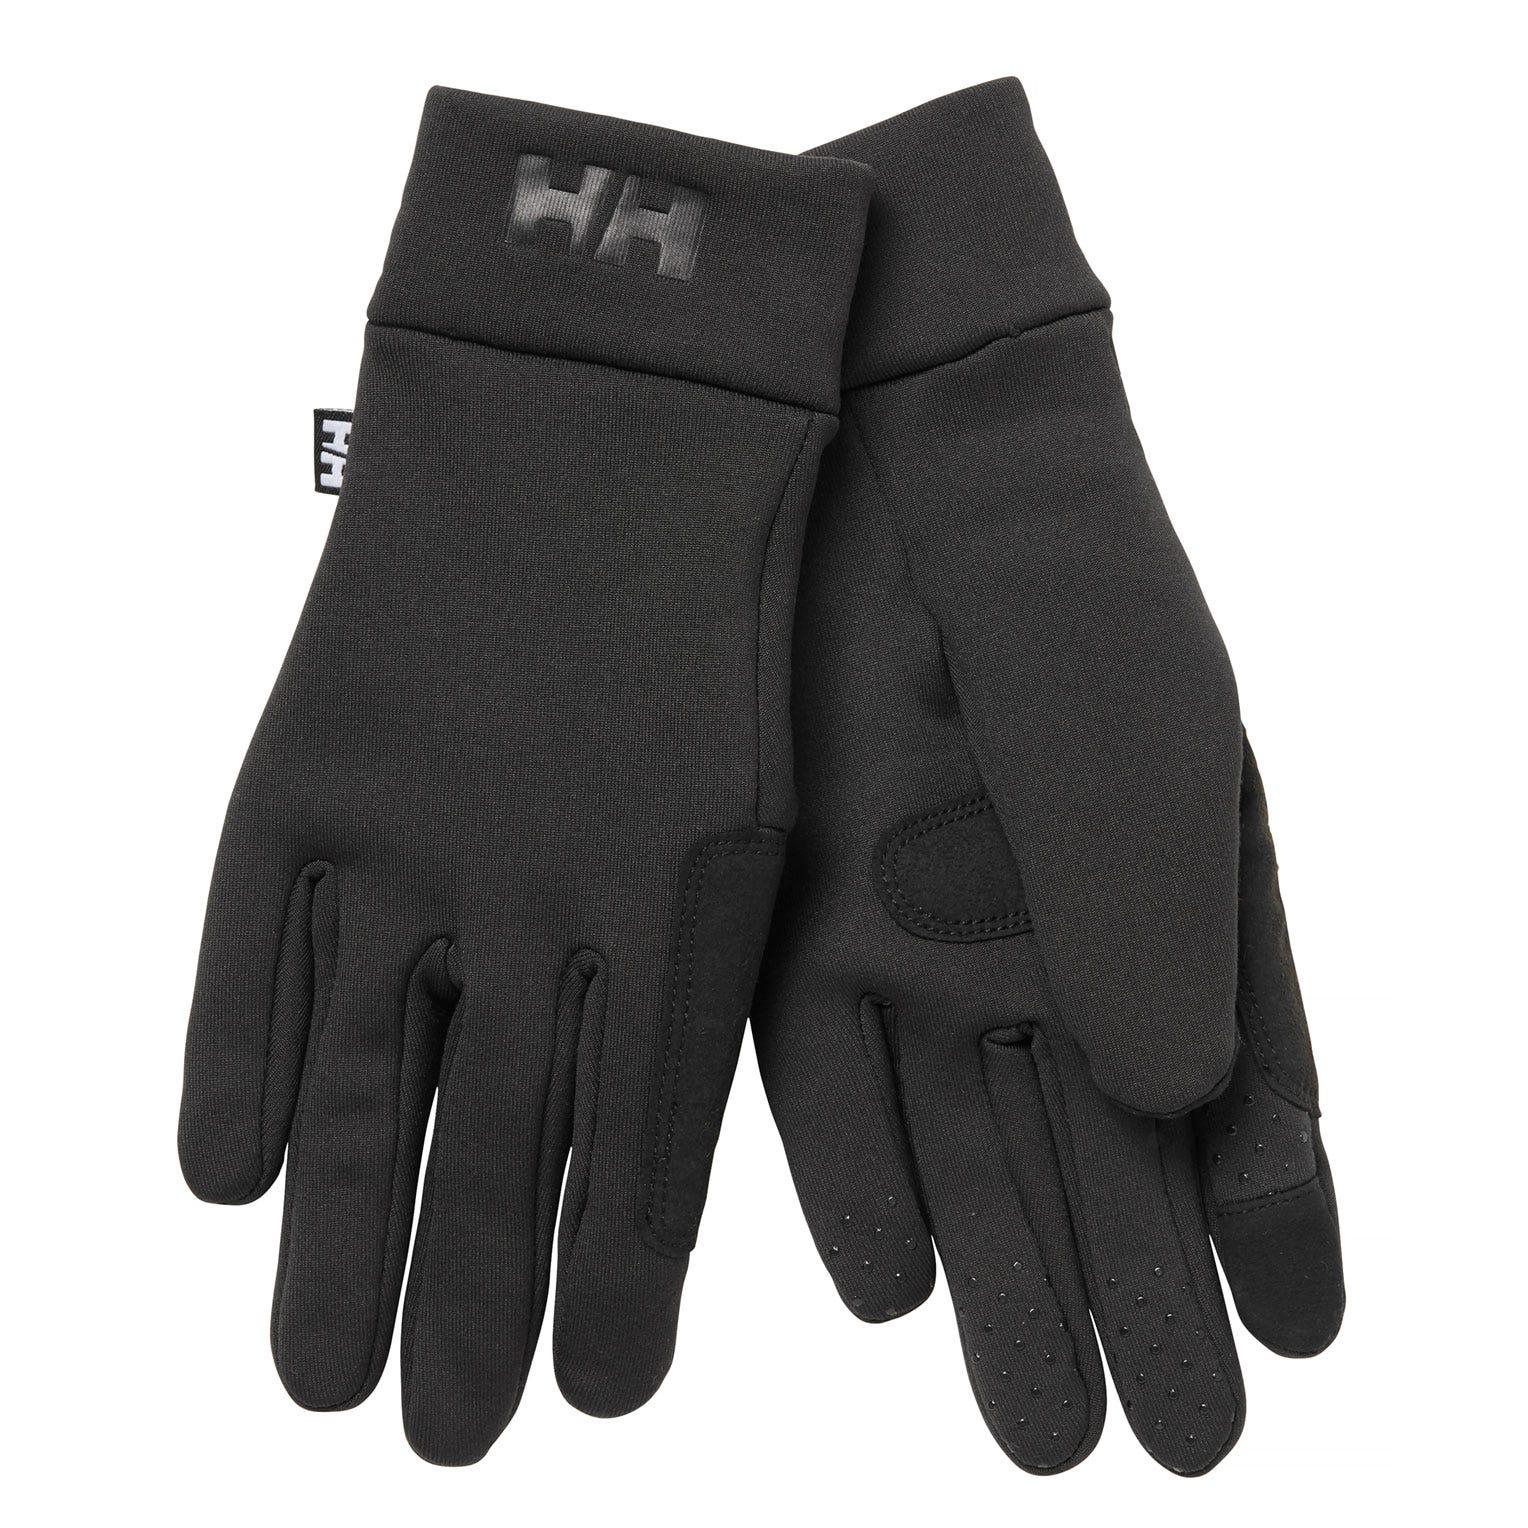 Helly Hansen Fleece Touch Glove Liner Black S